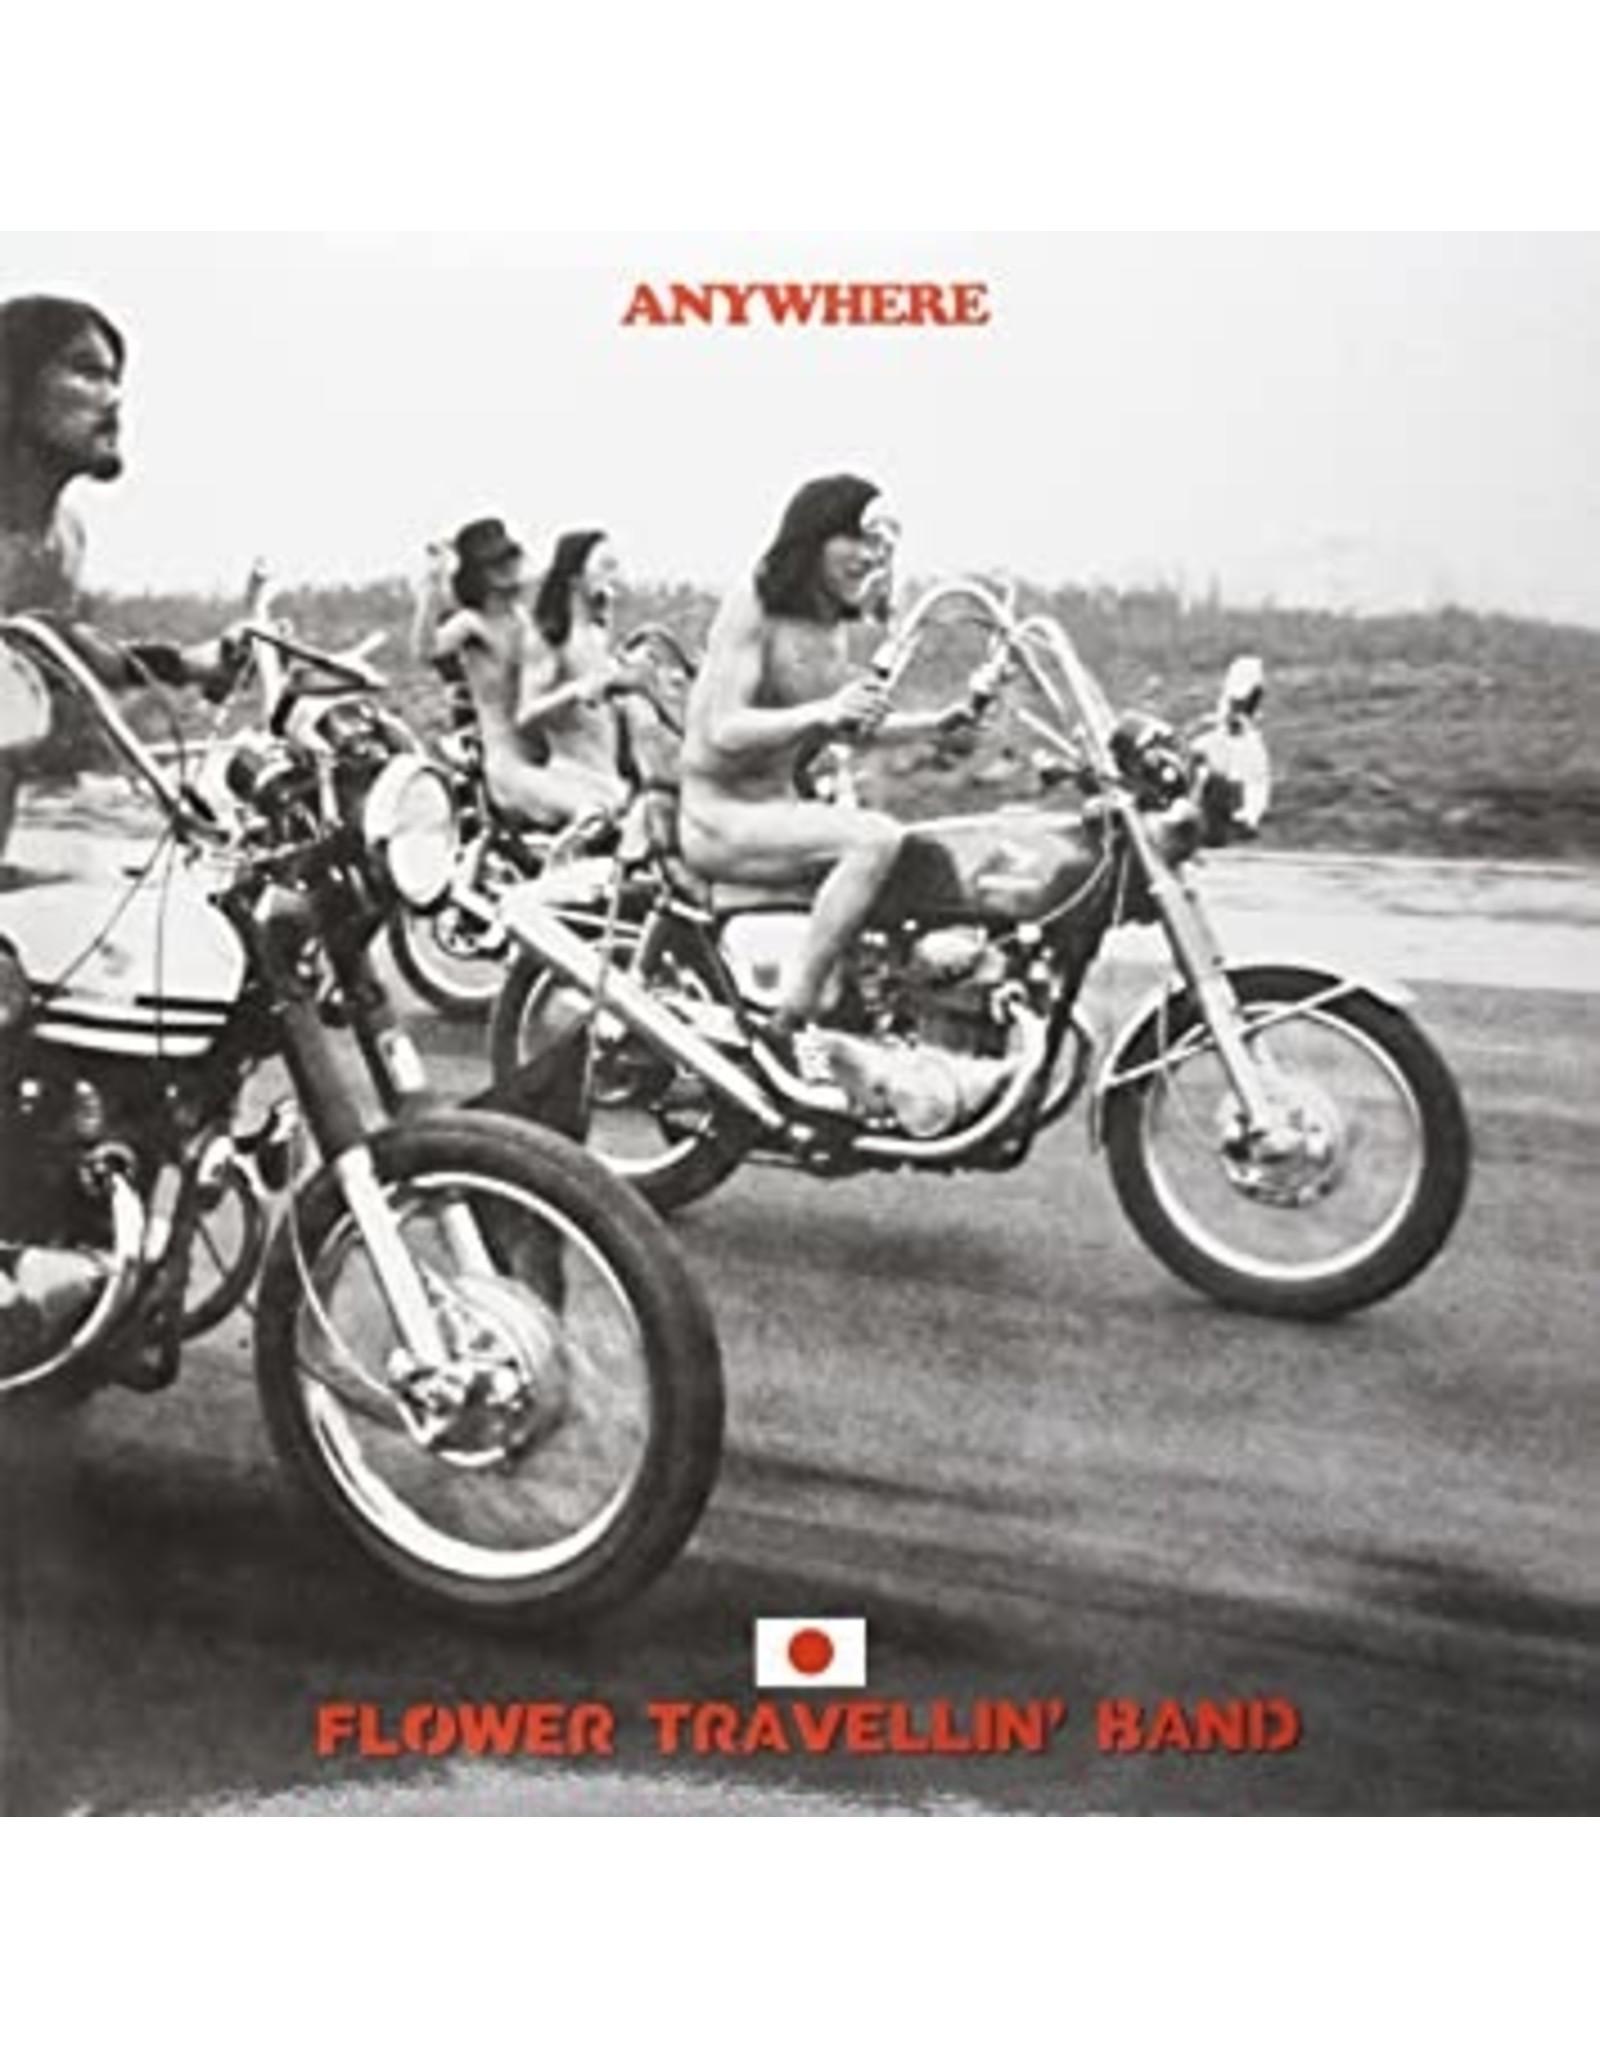 Flower Travellin' Band - Anywhere LP+CD